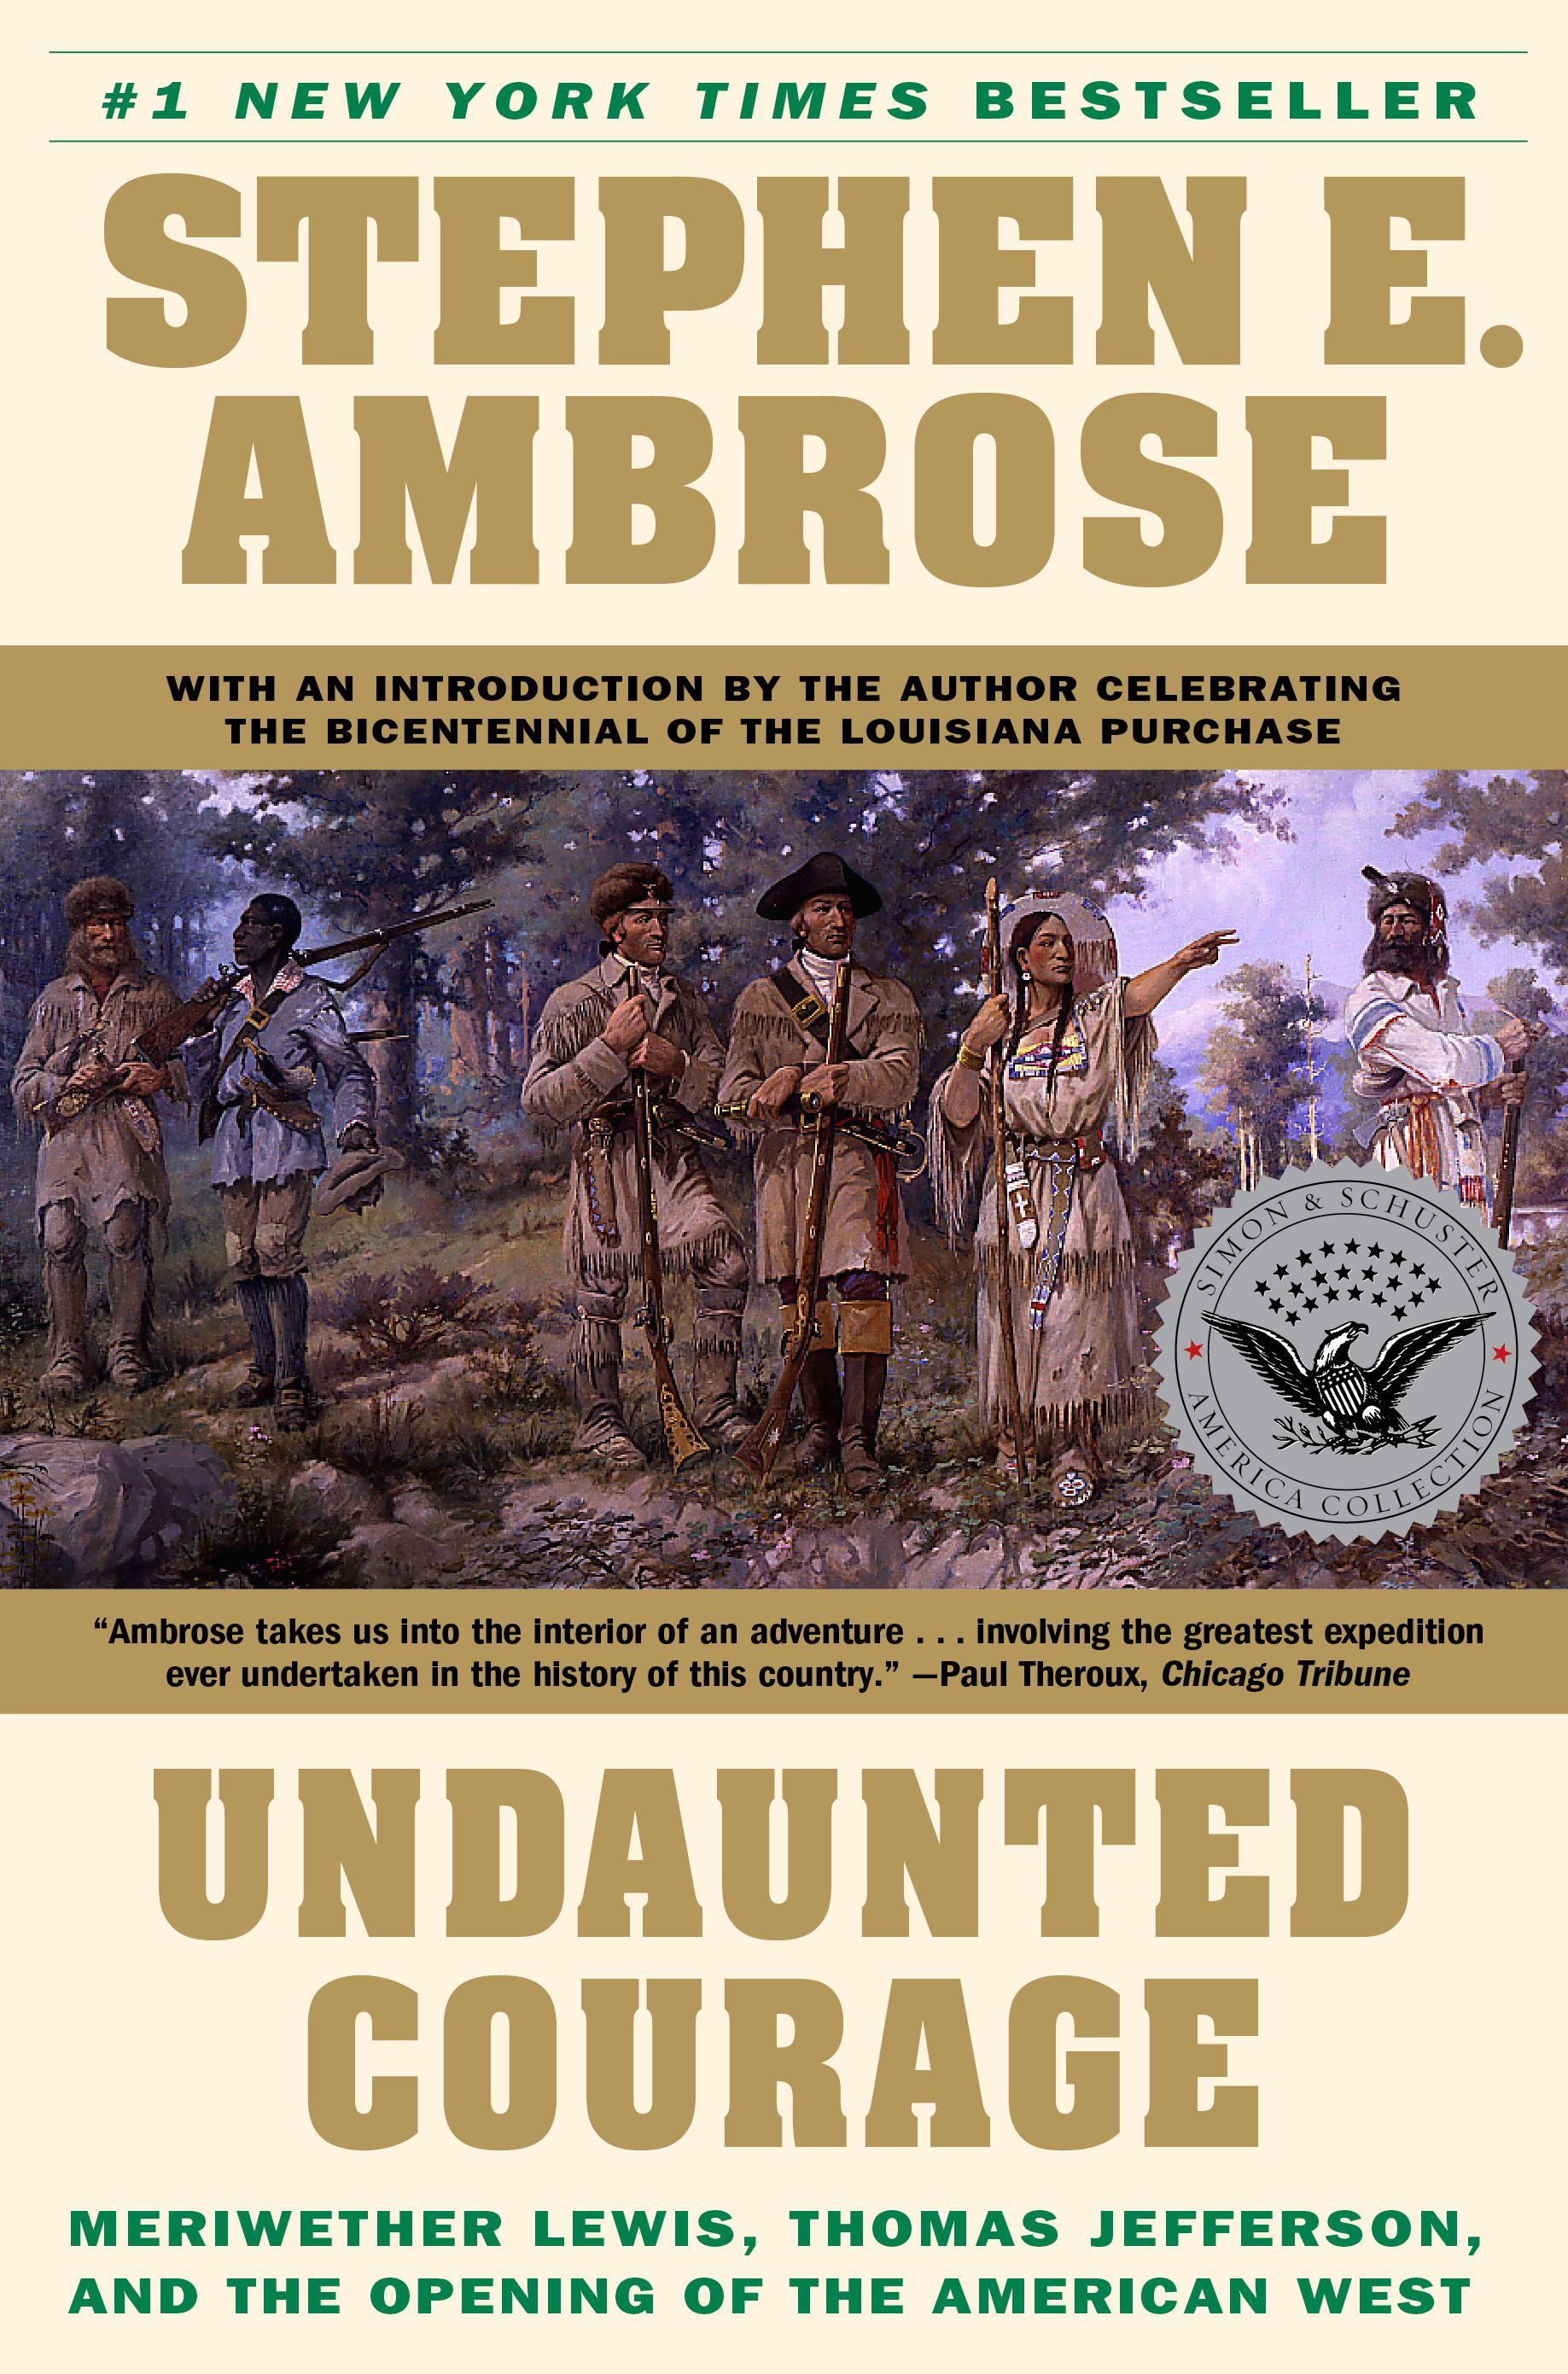 Undaunted Courage | Stephen E. Ambrose 9780684826974 Stephen E. Ambrose Simon & Schuster   Historische reisgidsen, Landeninformatie VS-West, Rocky Mountains